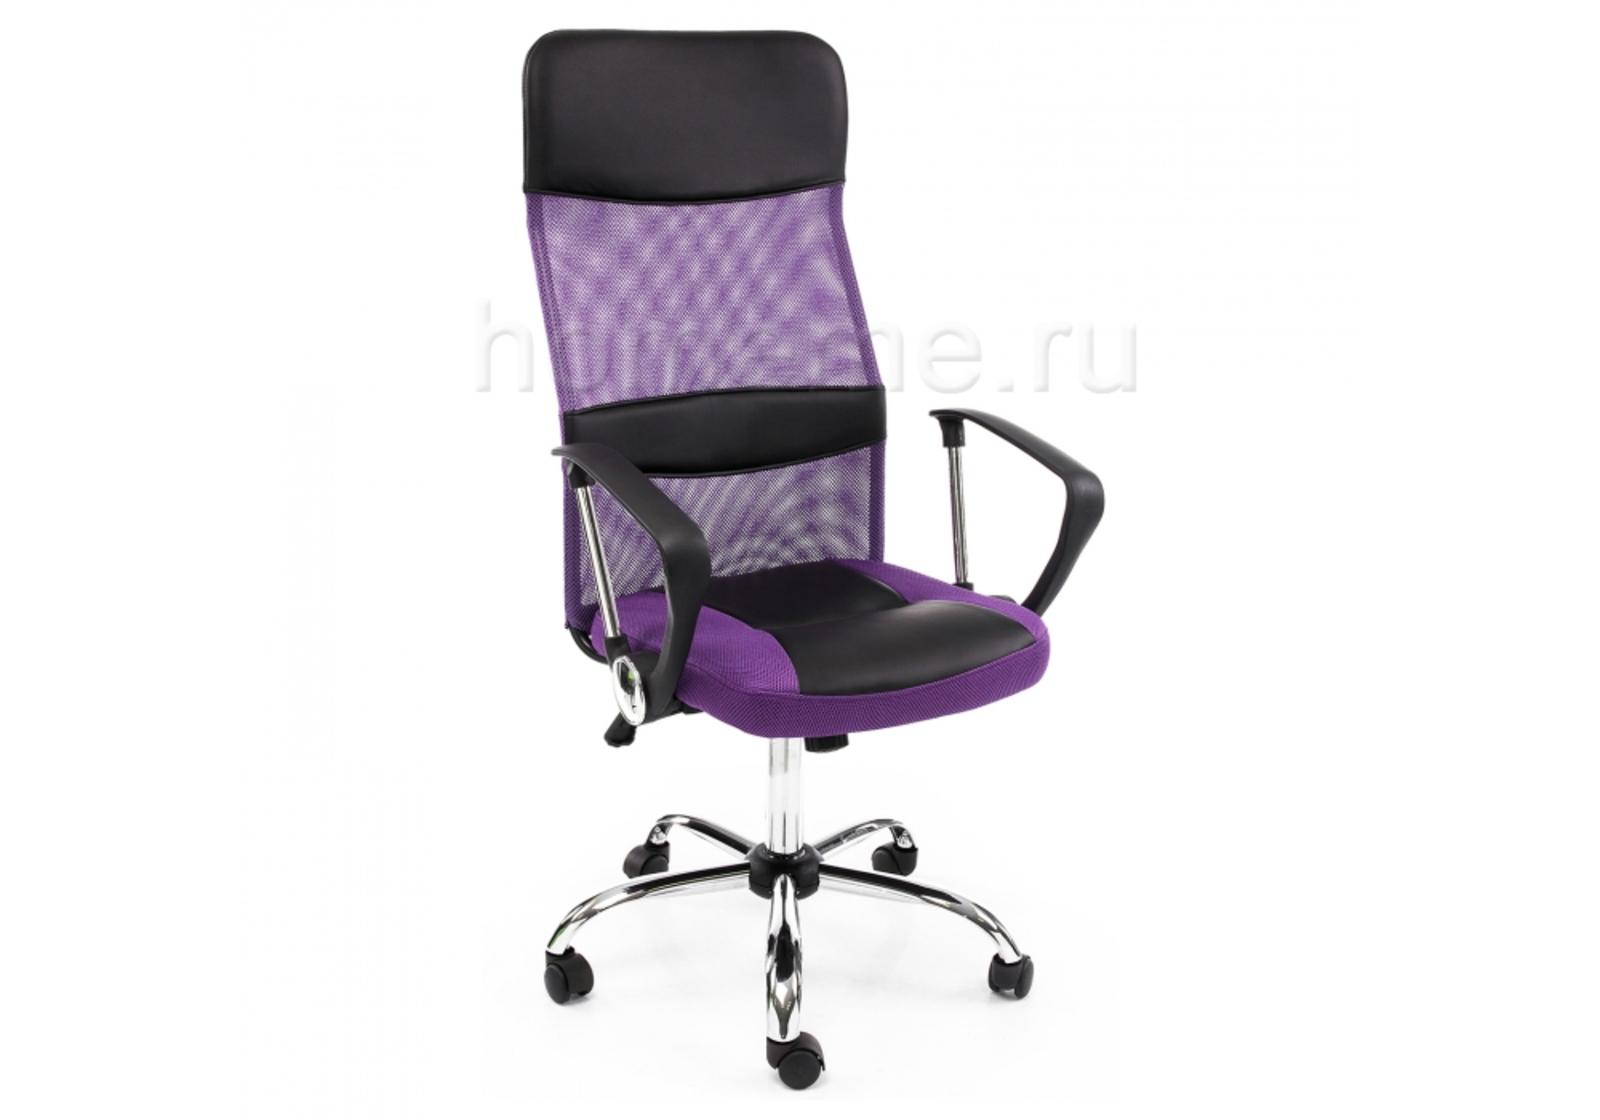 Кресло для офиса HomeMe Arano фиолетовое 1646 от Homeme.ru